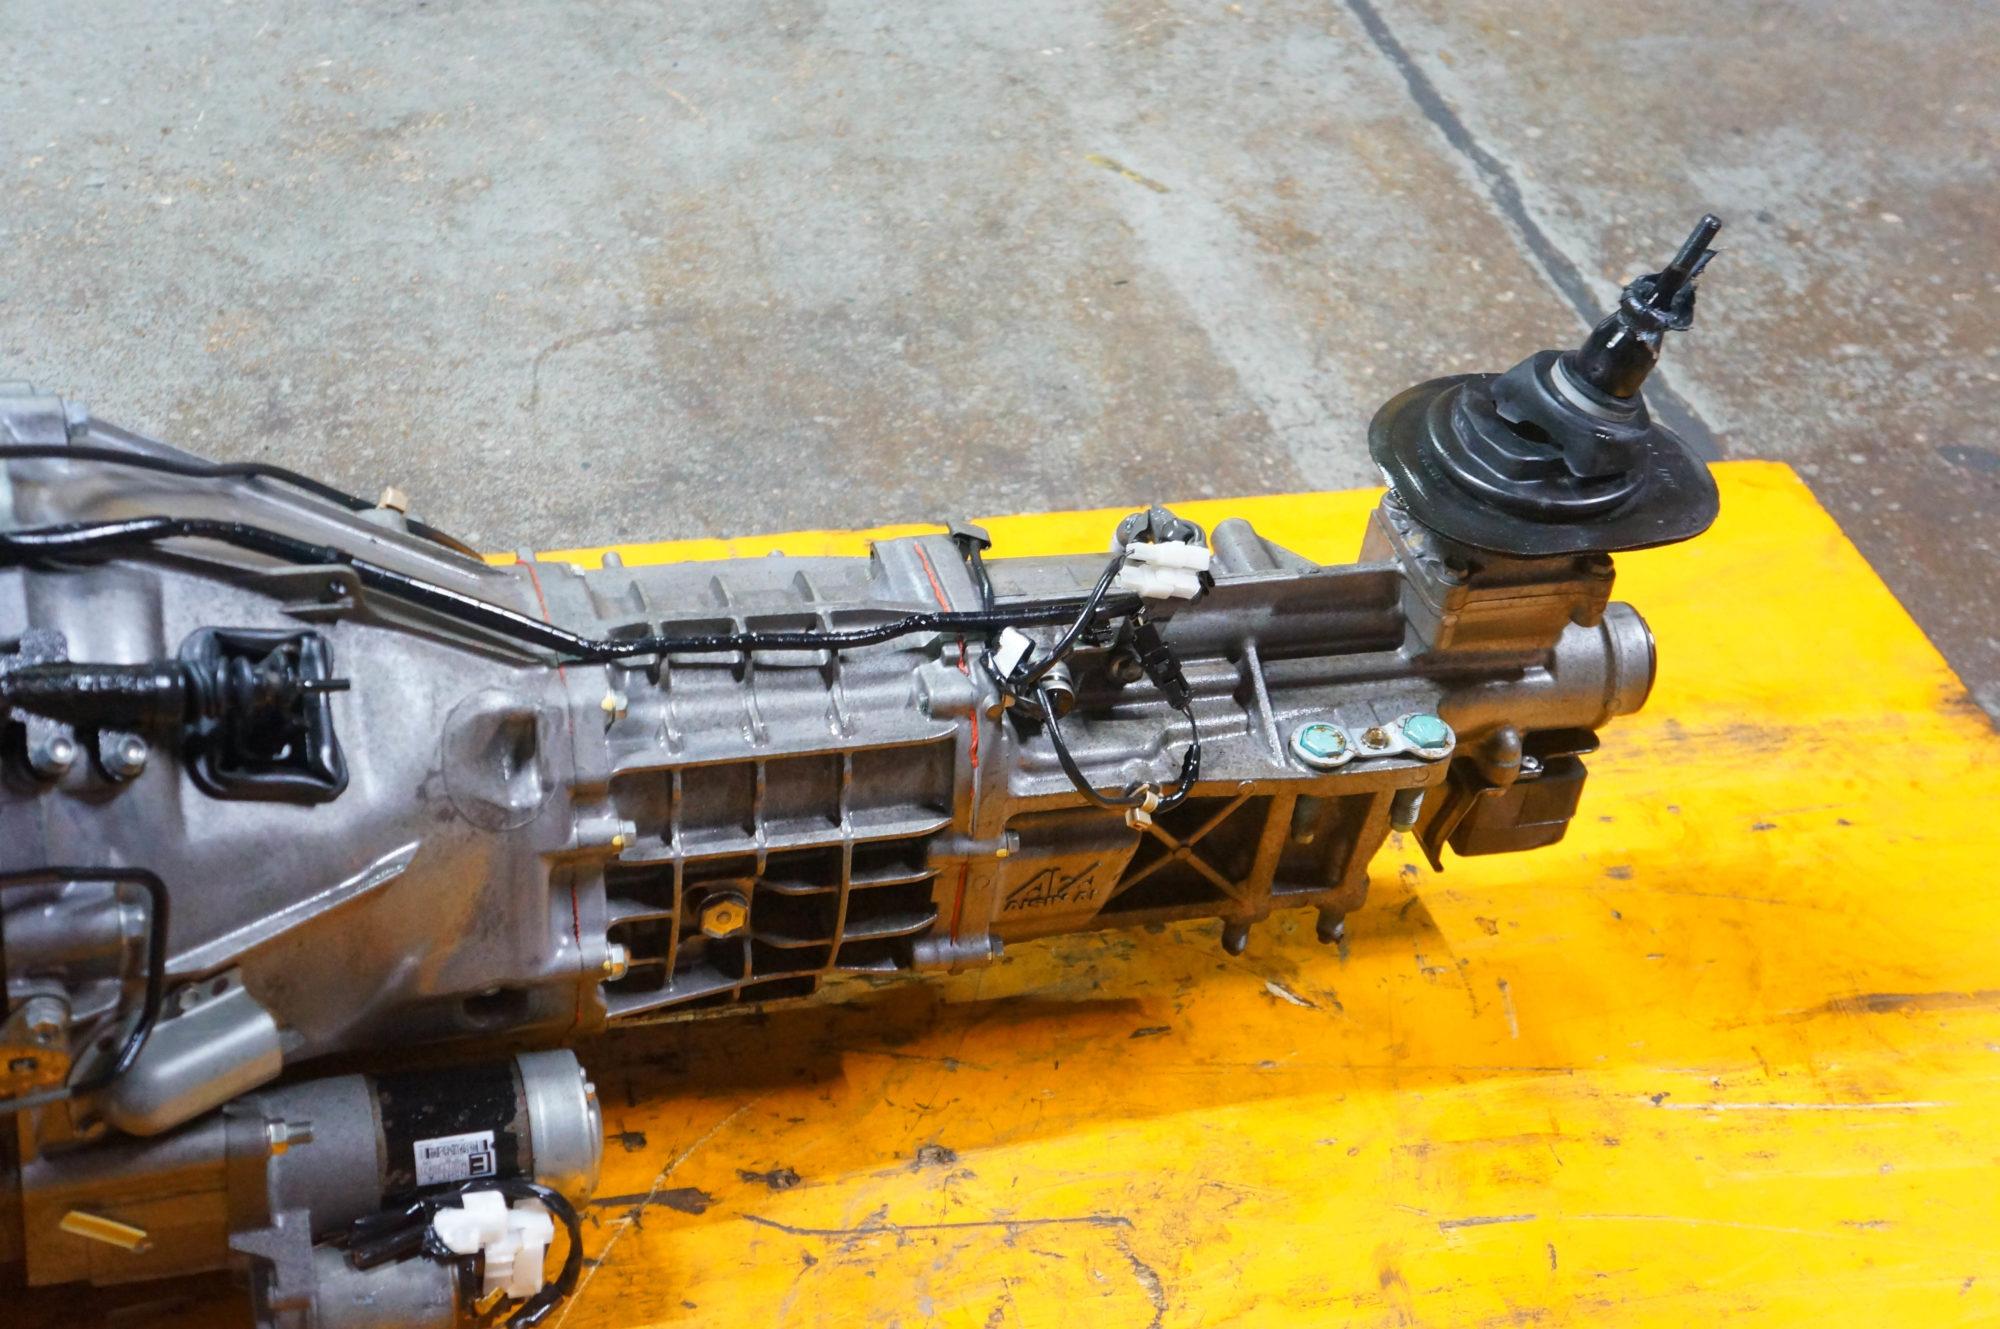 JDM 13B RX8 ENGINE 6 PORT WITH 6 SPEED TRANSMISSION